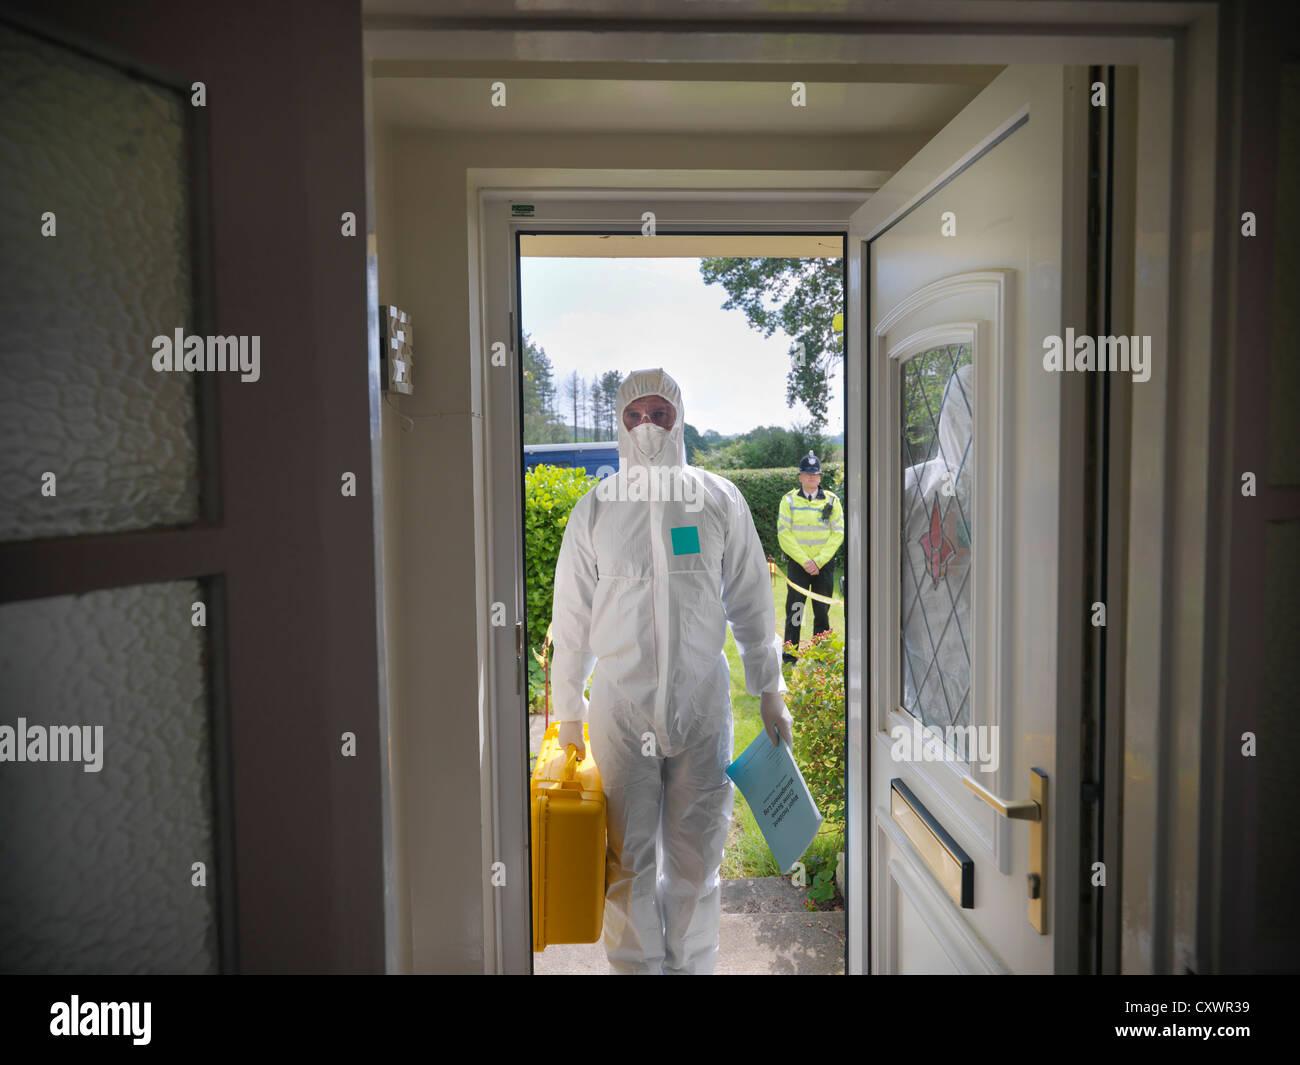 Forensic scientist at crime scene - Stock Image